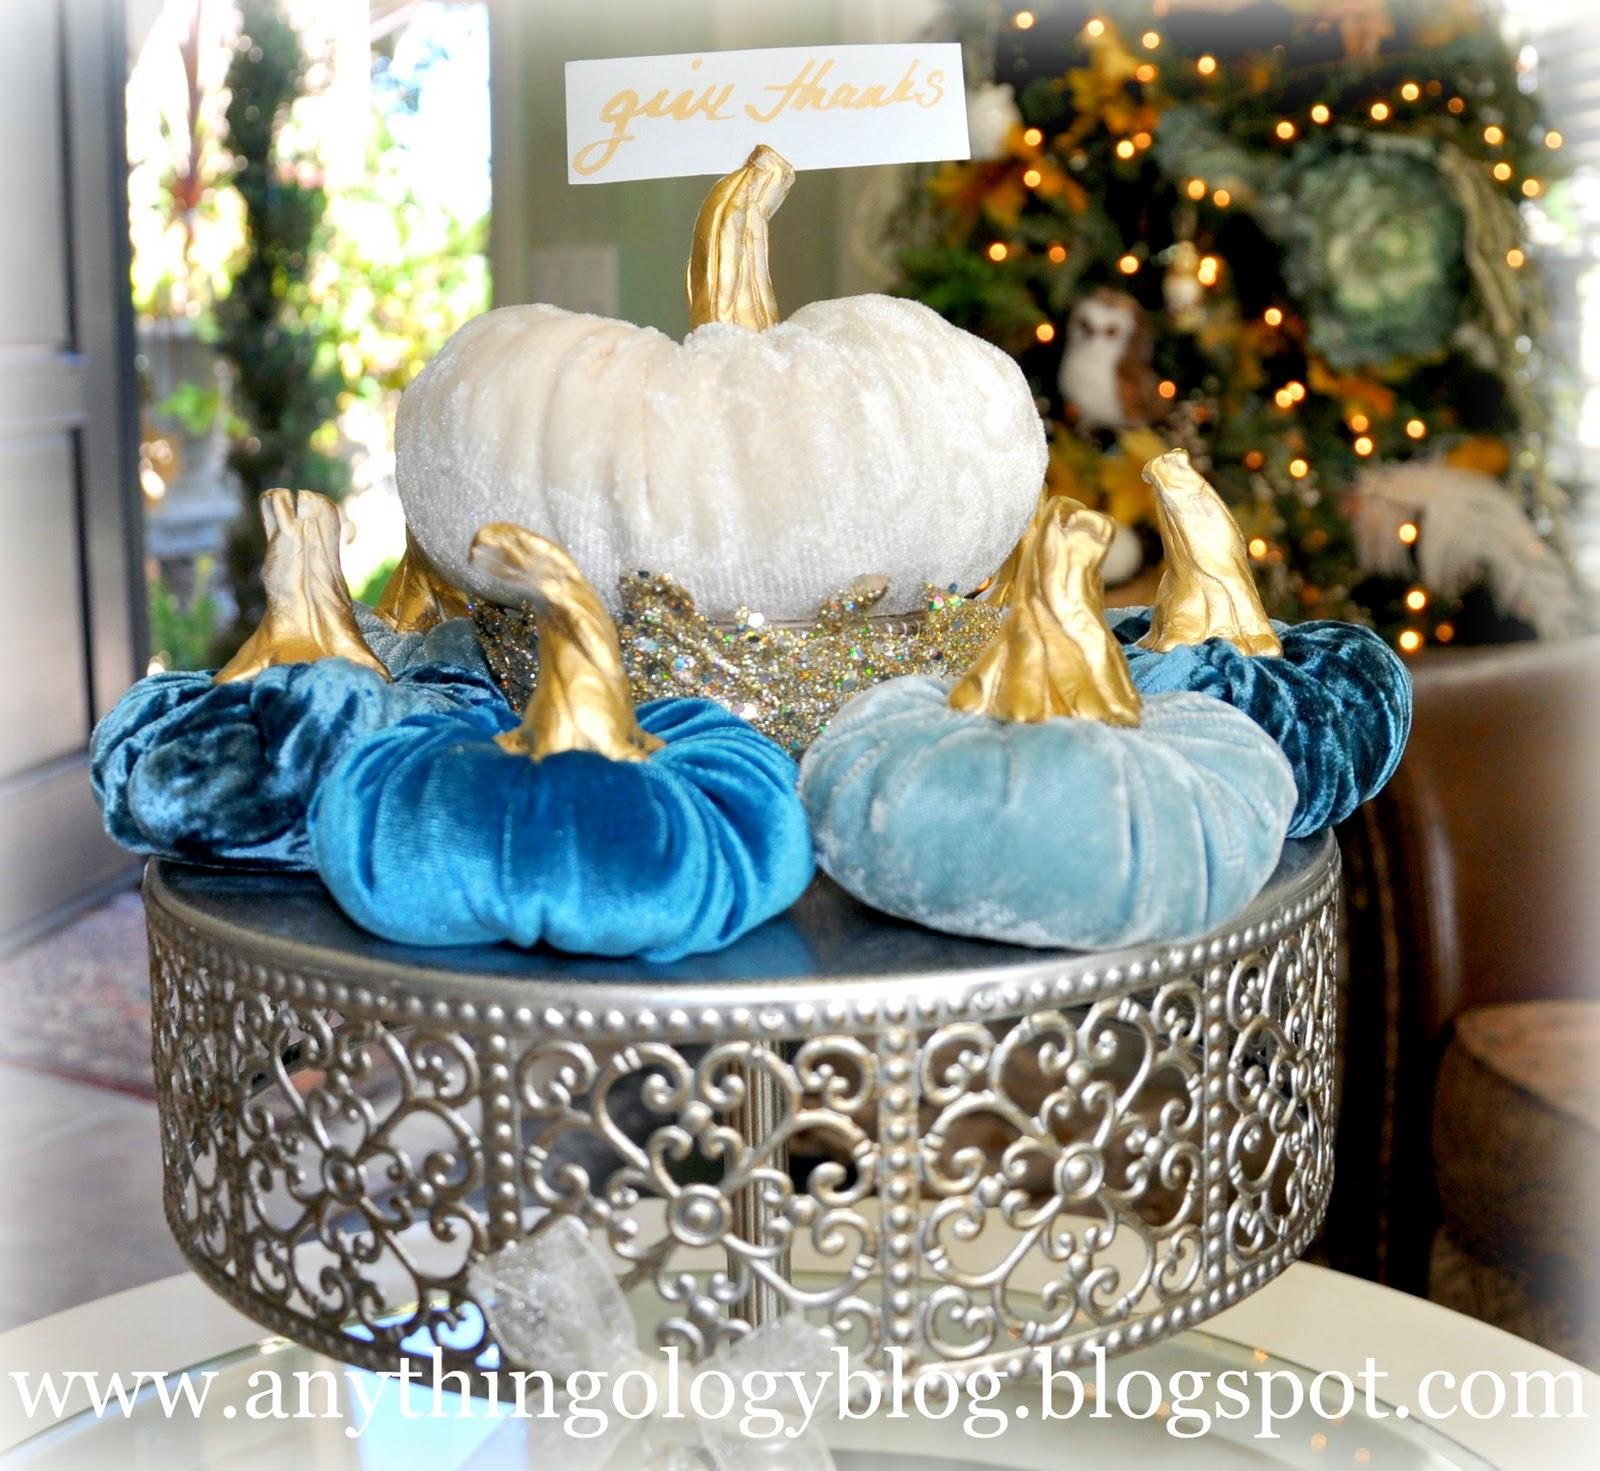 Pumpkin stems for crafts - Velvet Pumpkins And A Thanksgiving Tablescape Preview